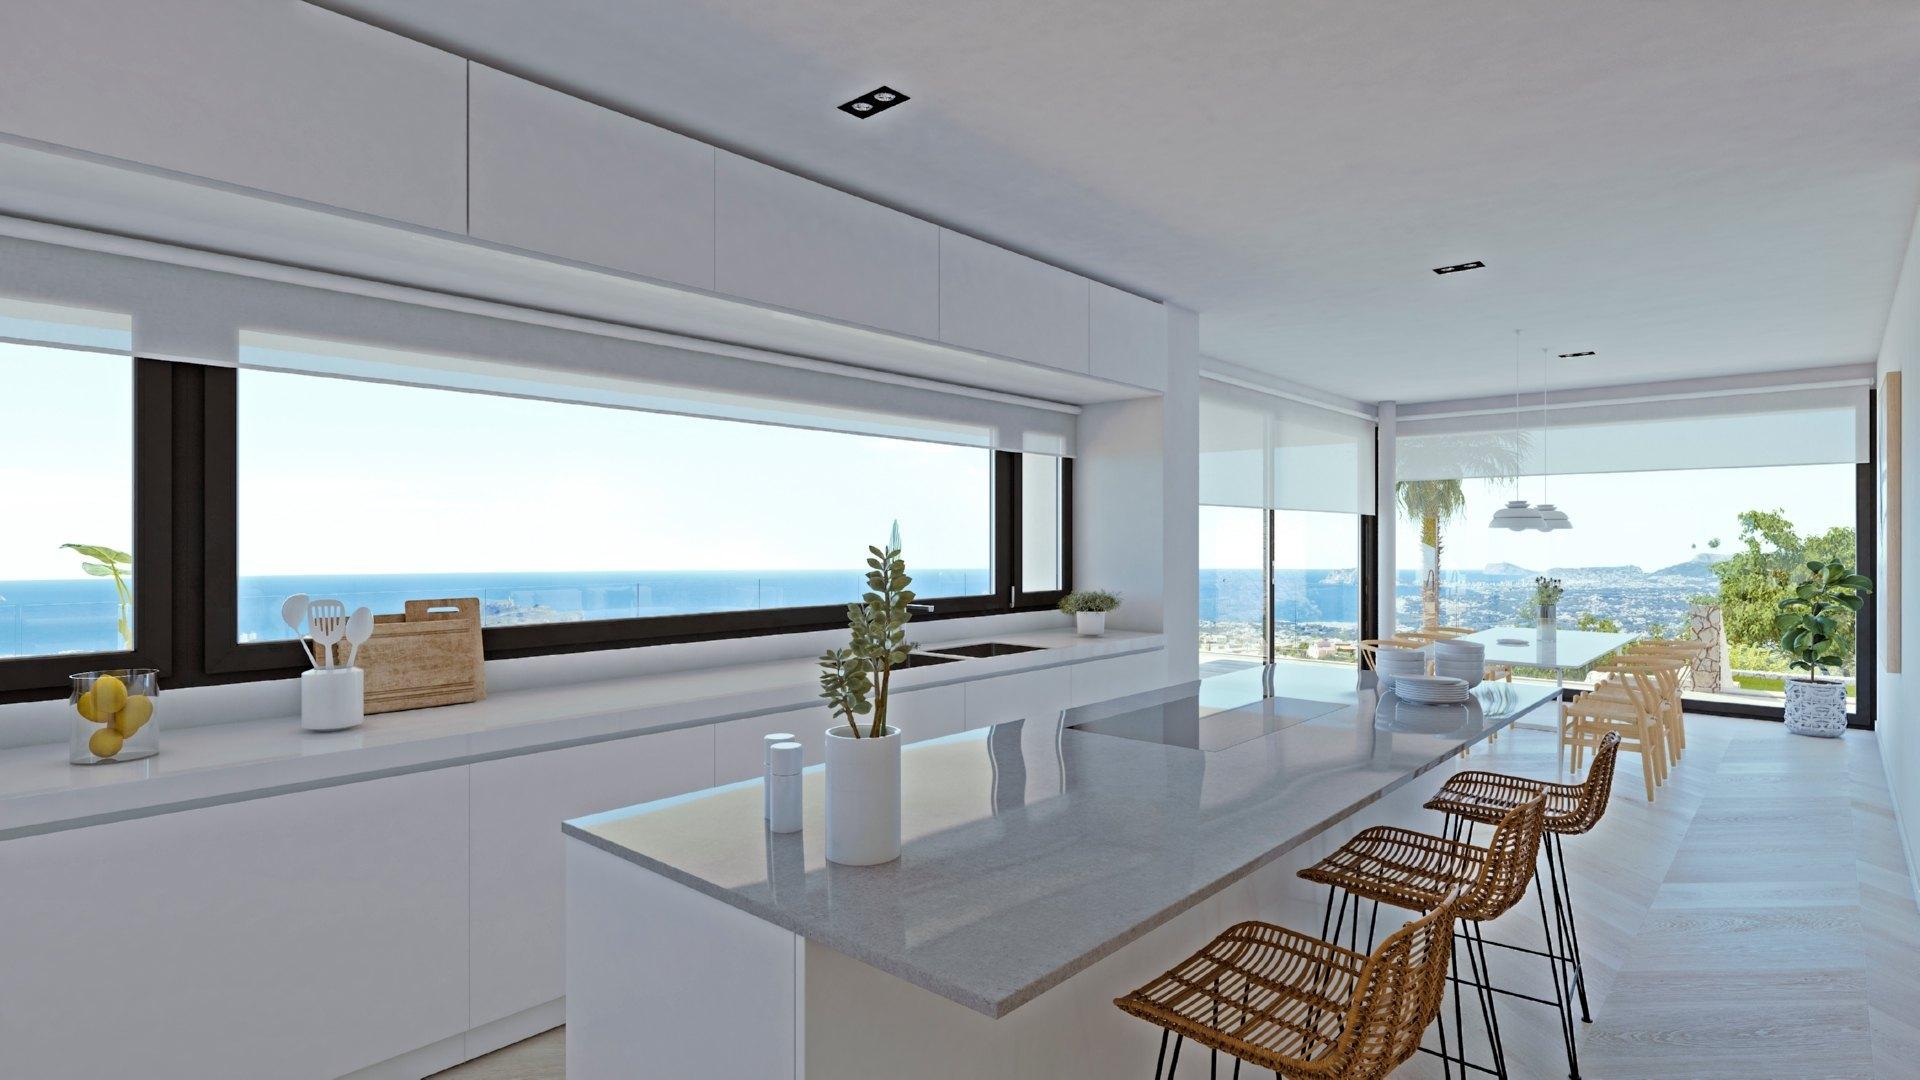 Modern luxury villa for sale in Residencial Jazmines Cumbre del Sol - Costa Blanca